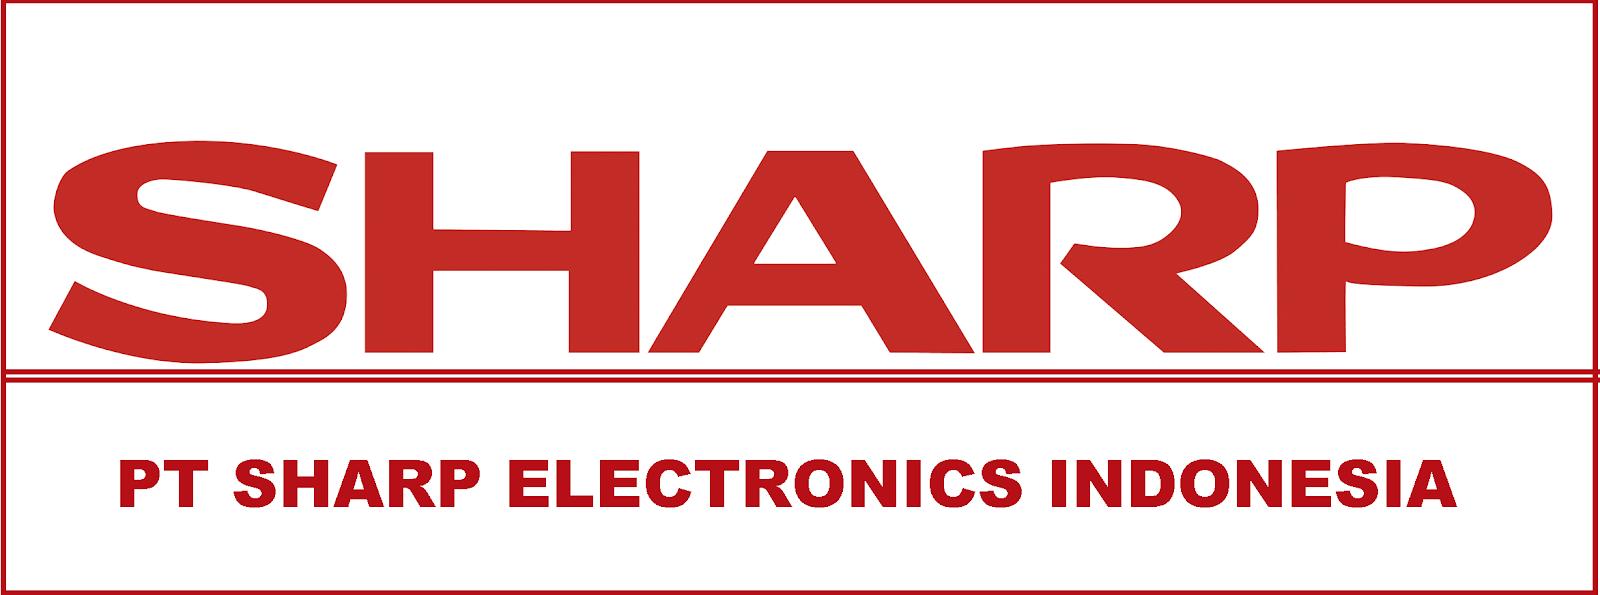 Info Lowongan Kerja Terbaru Bulan Mei 2018 PT Sharp Electronics Indonesia